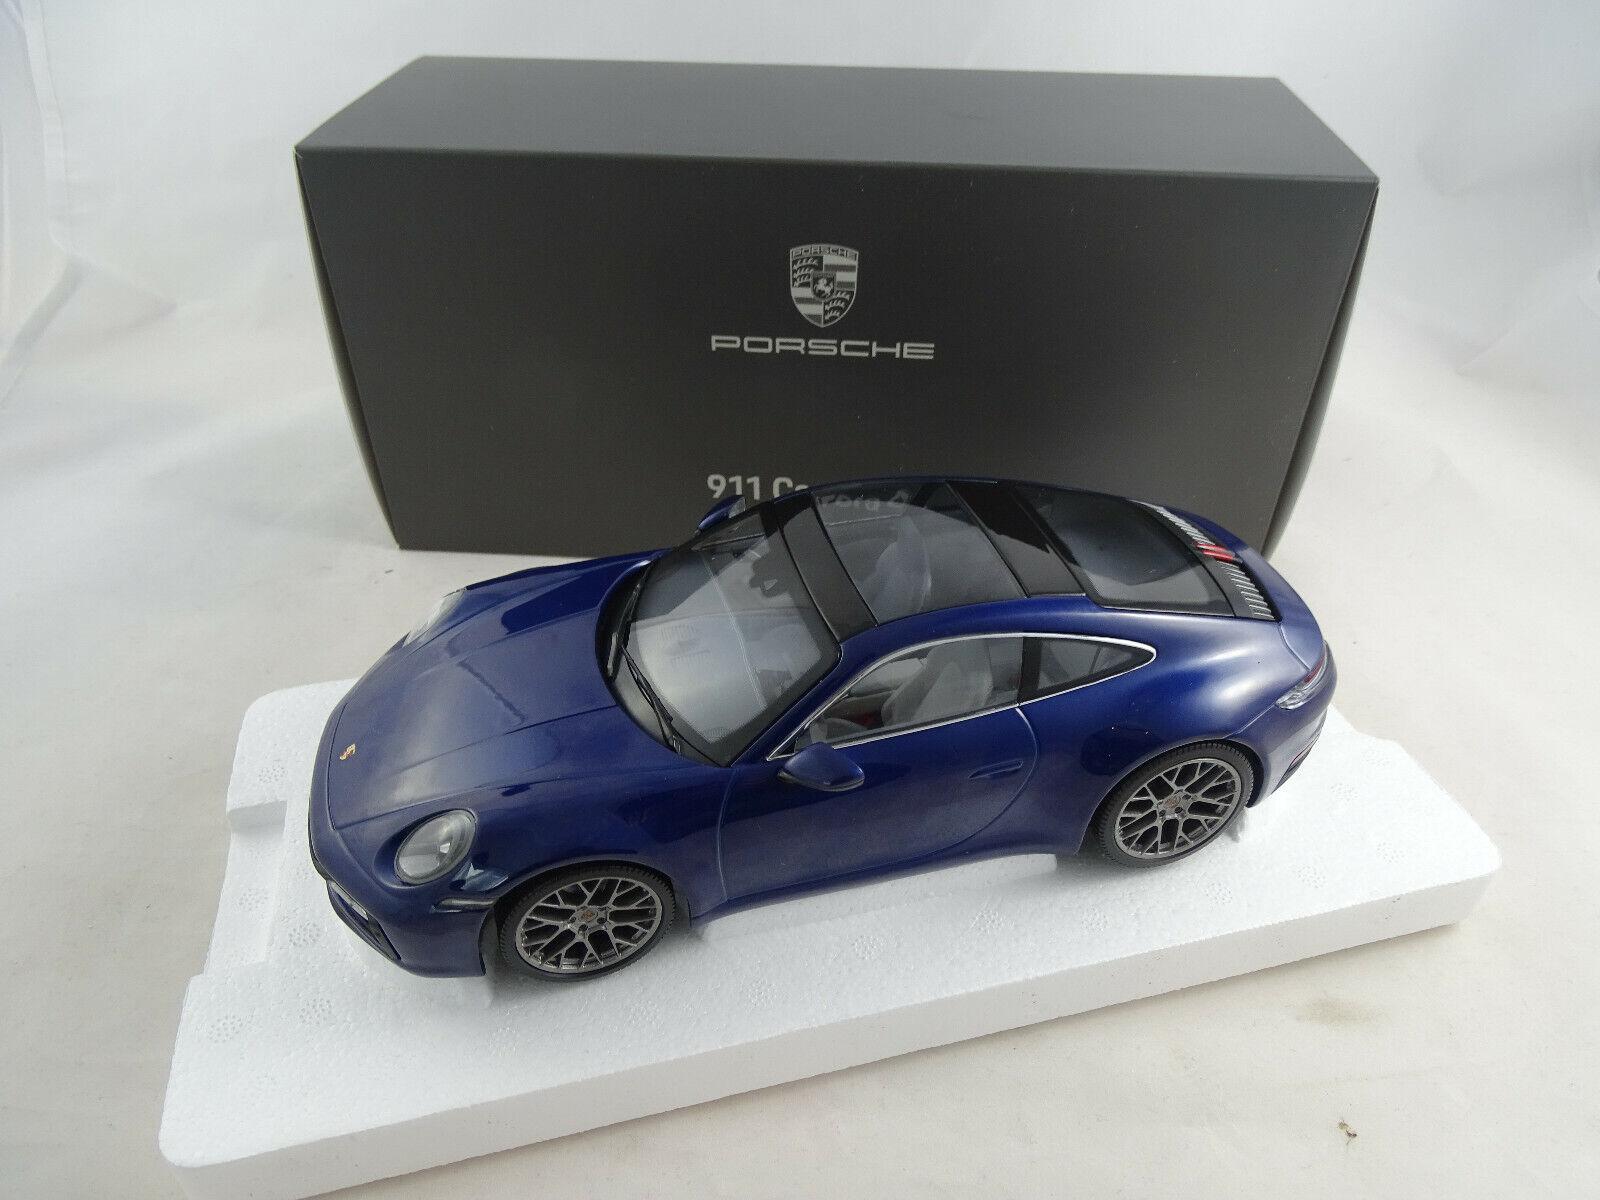 1 18 Minichamps Dealer PORSCHE 911 CARRERA 4 S Bleu Nouveau Neuf dans sa boîte